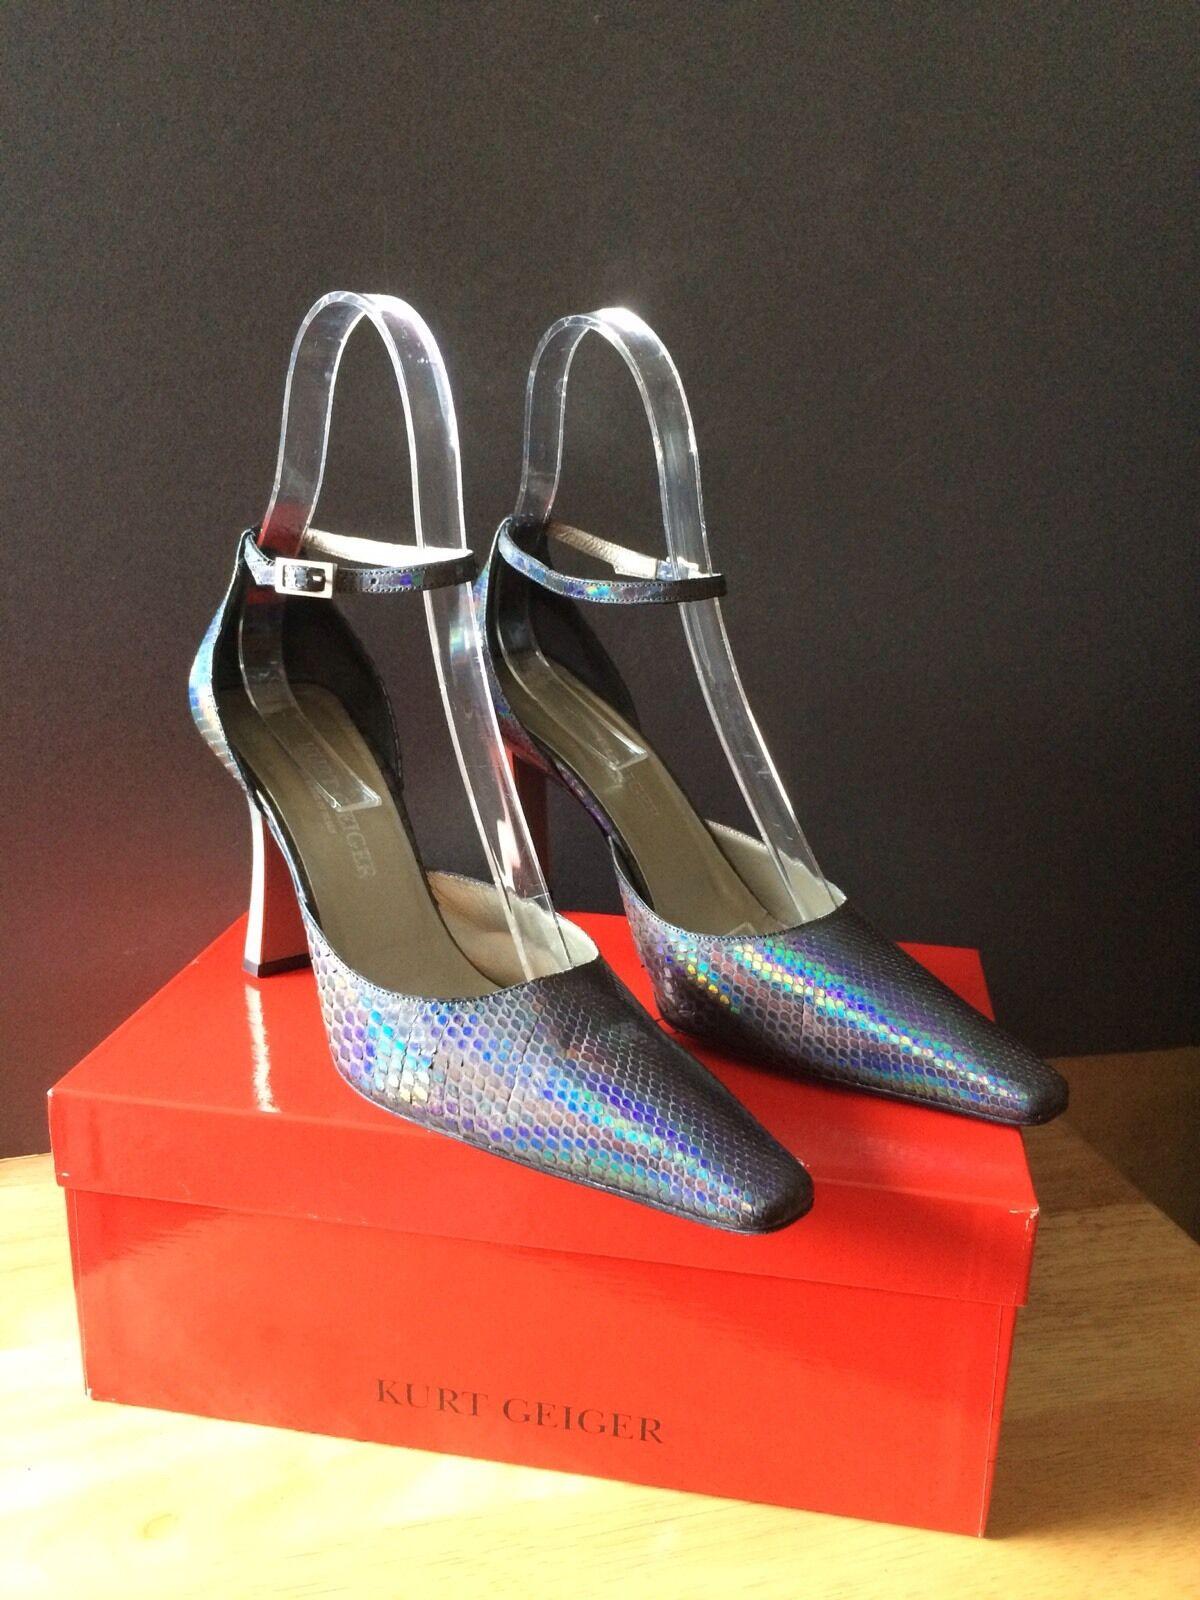 KURT GEIGER VINTAGE LADIES Schuhe 6.5 39 1/2 SLITHER GREY LIZARDPRINT COURTS